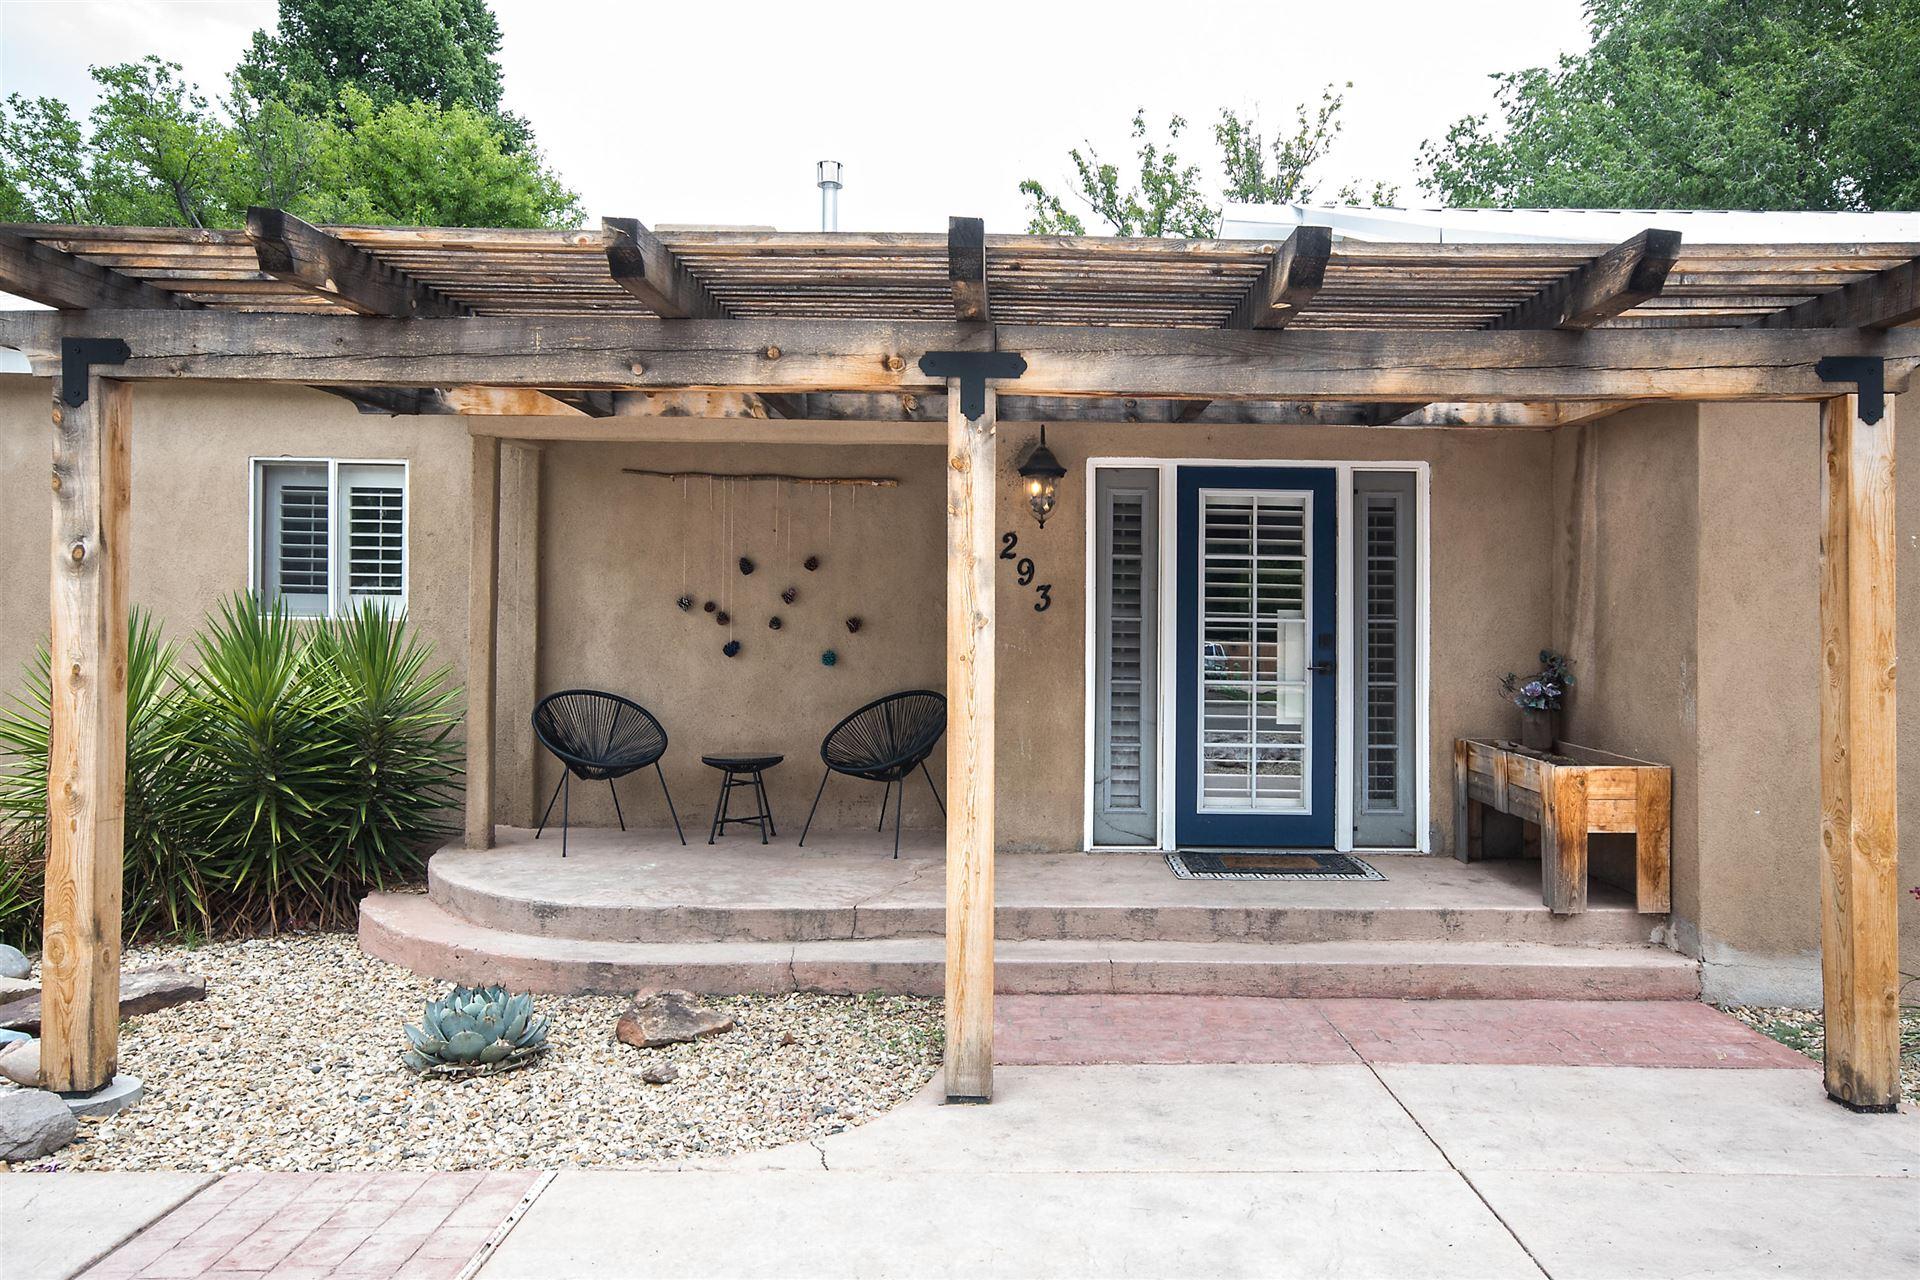 Photo of 293 ALAMOSA Road NW, Albuquerque, NM 87107 (MLS # 974416)